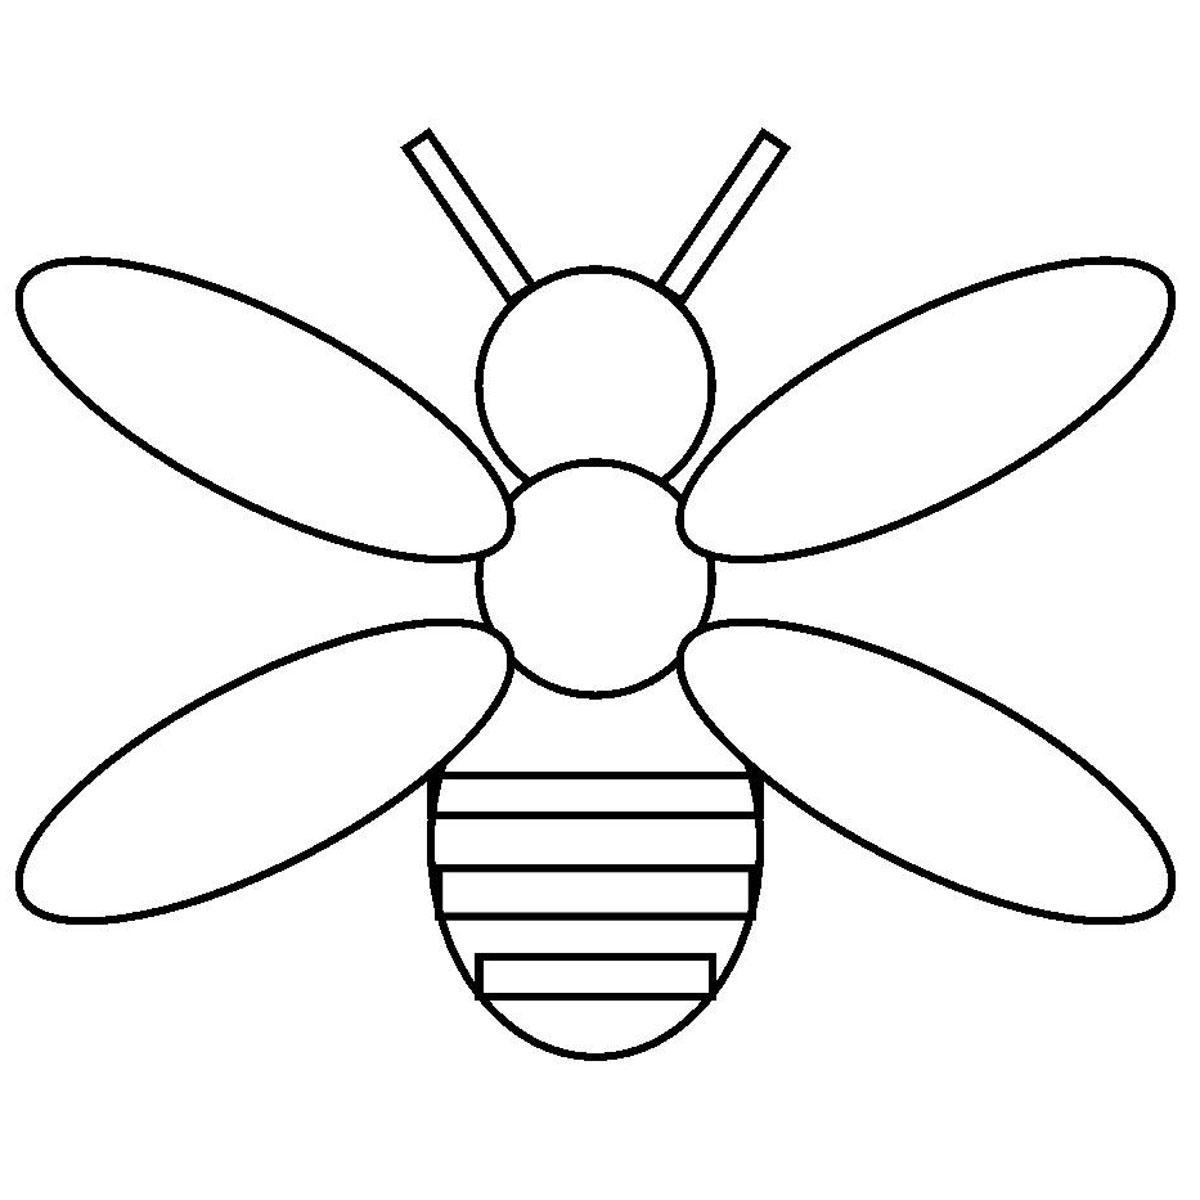 Drawing at getdrawings com. Bug clipart lightning bug